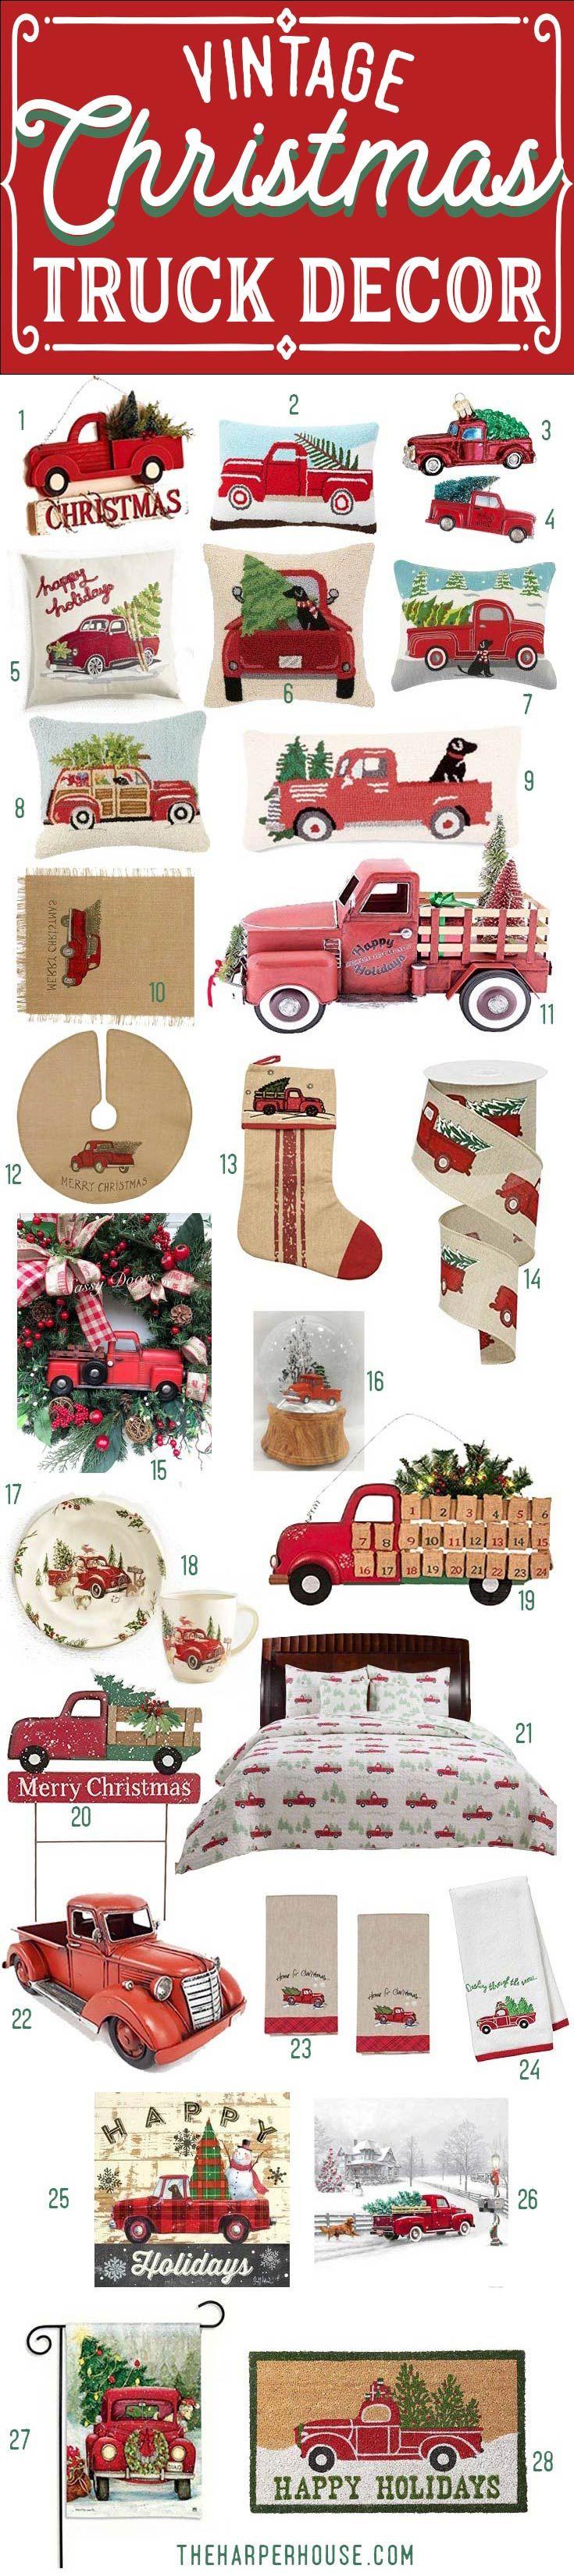 235 best christmas decor images on Pinterest